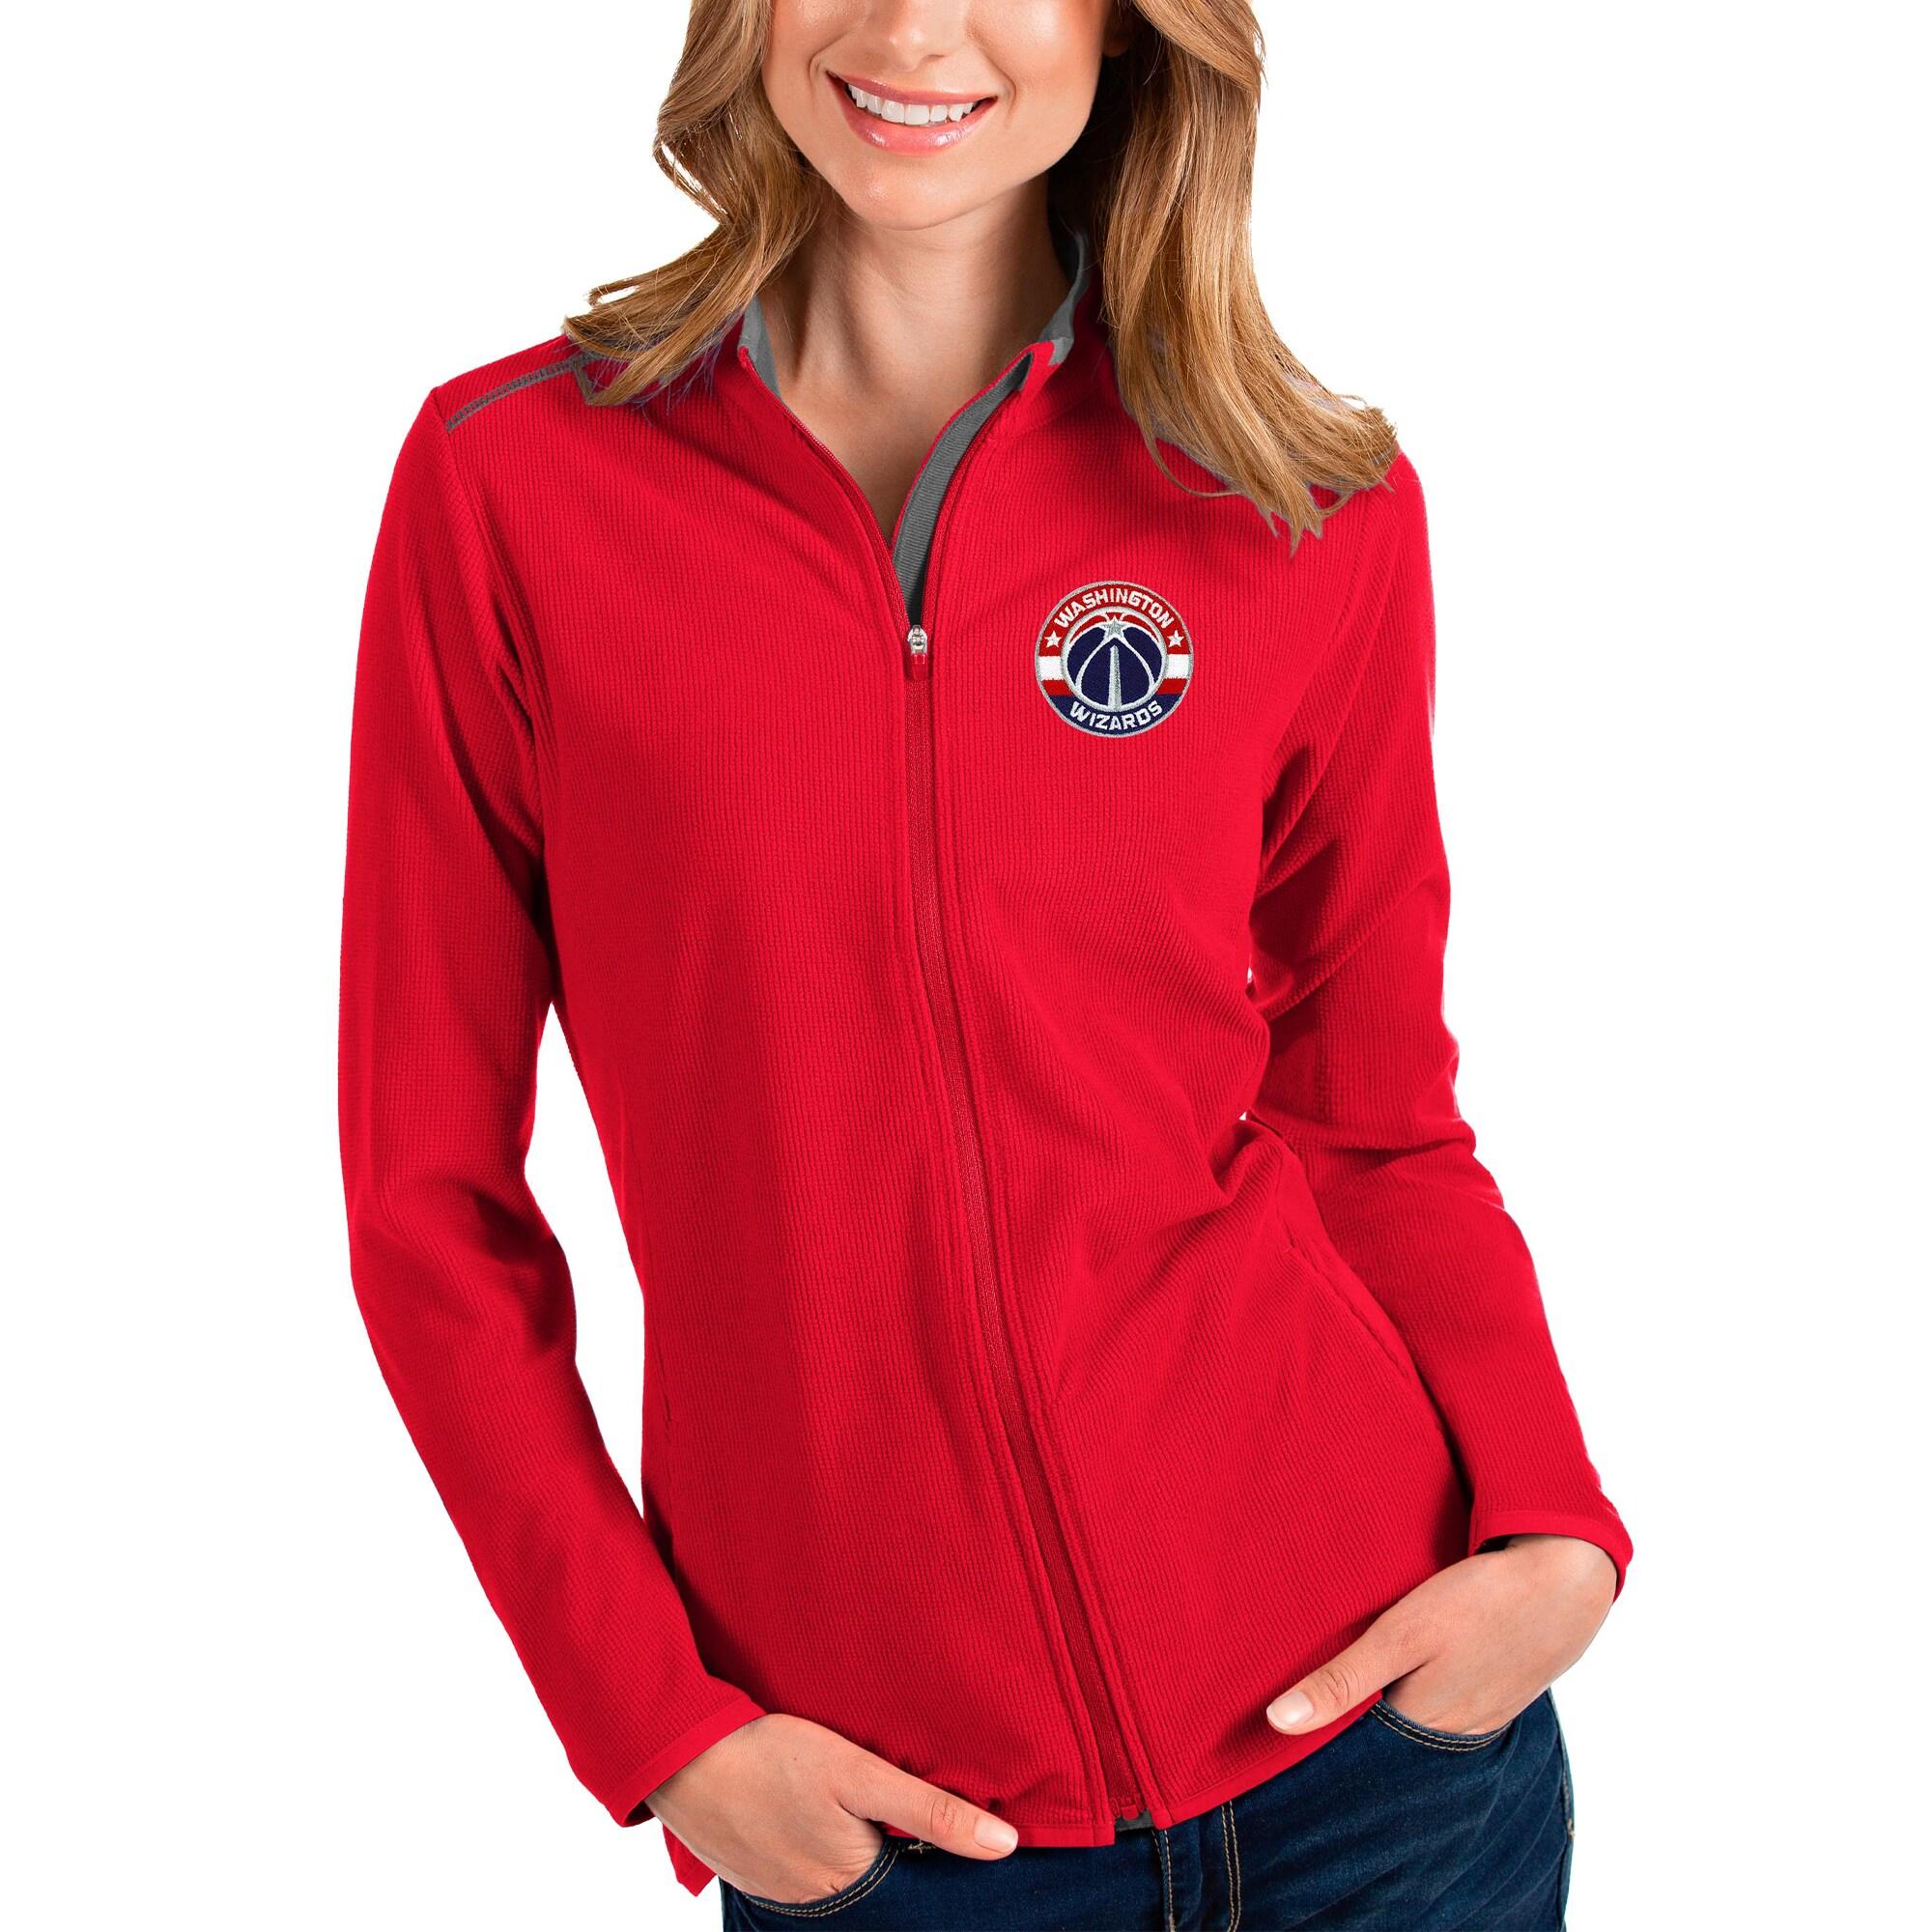 Washington Wizards Antigua Women's Glacier Full-Zip Jacket - Red/Gray